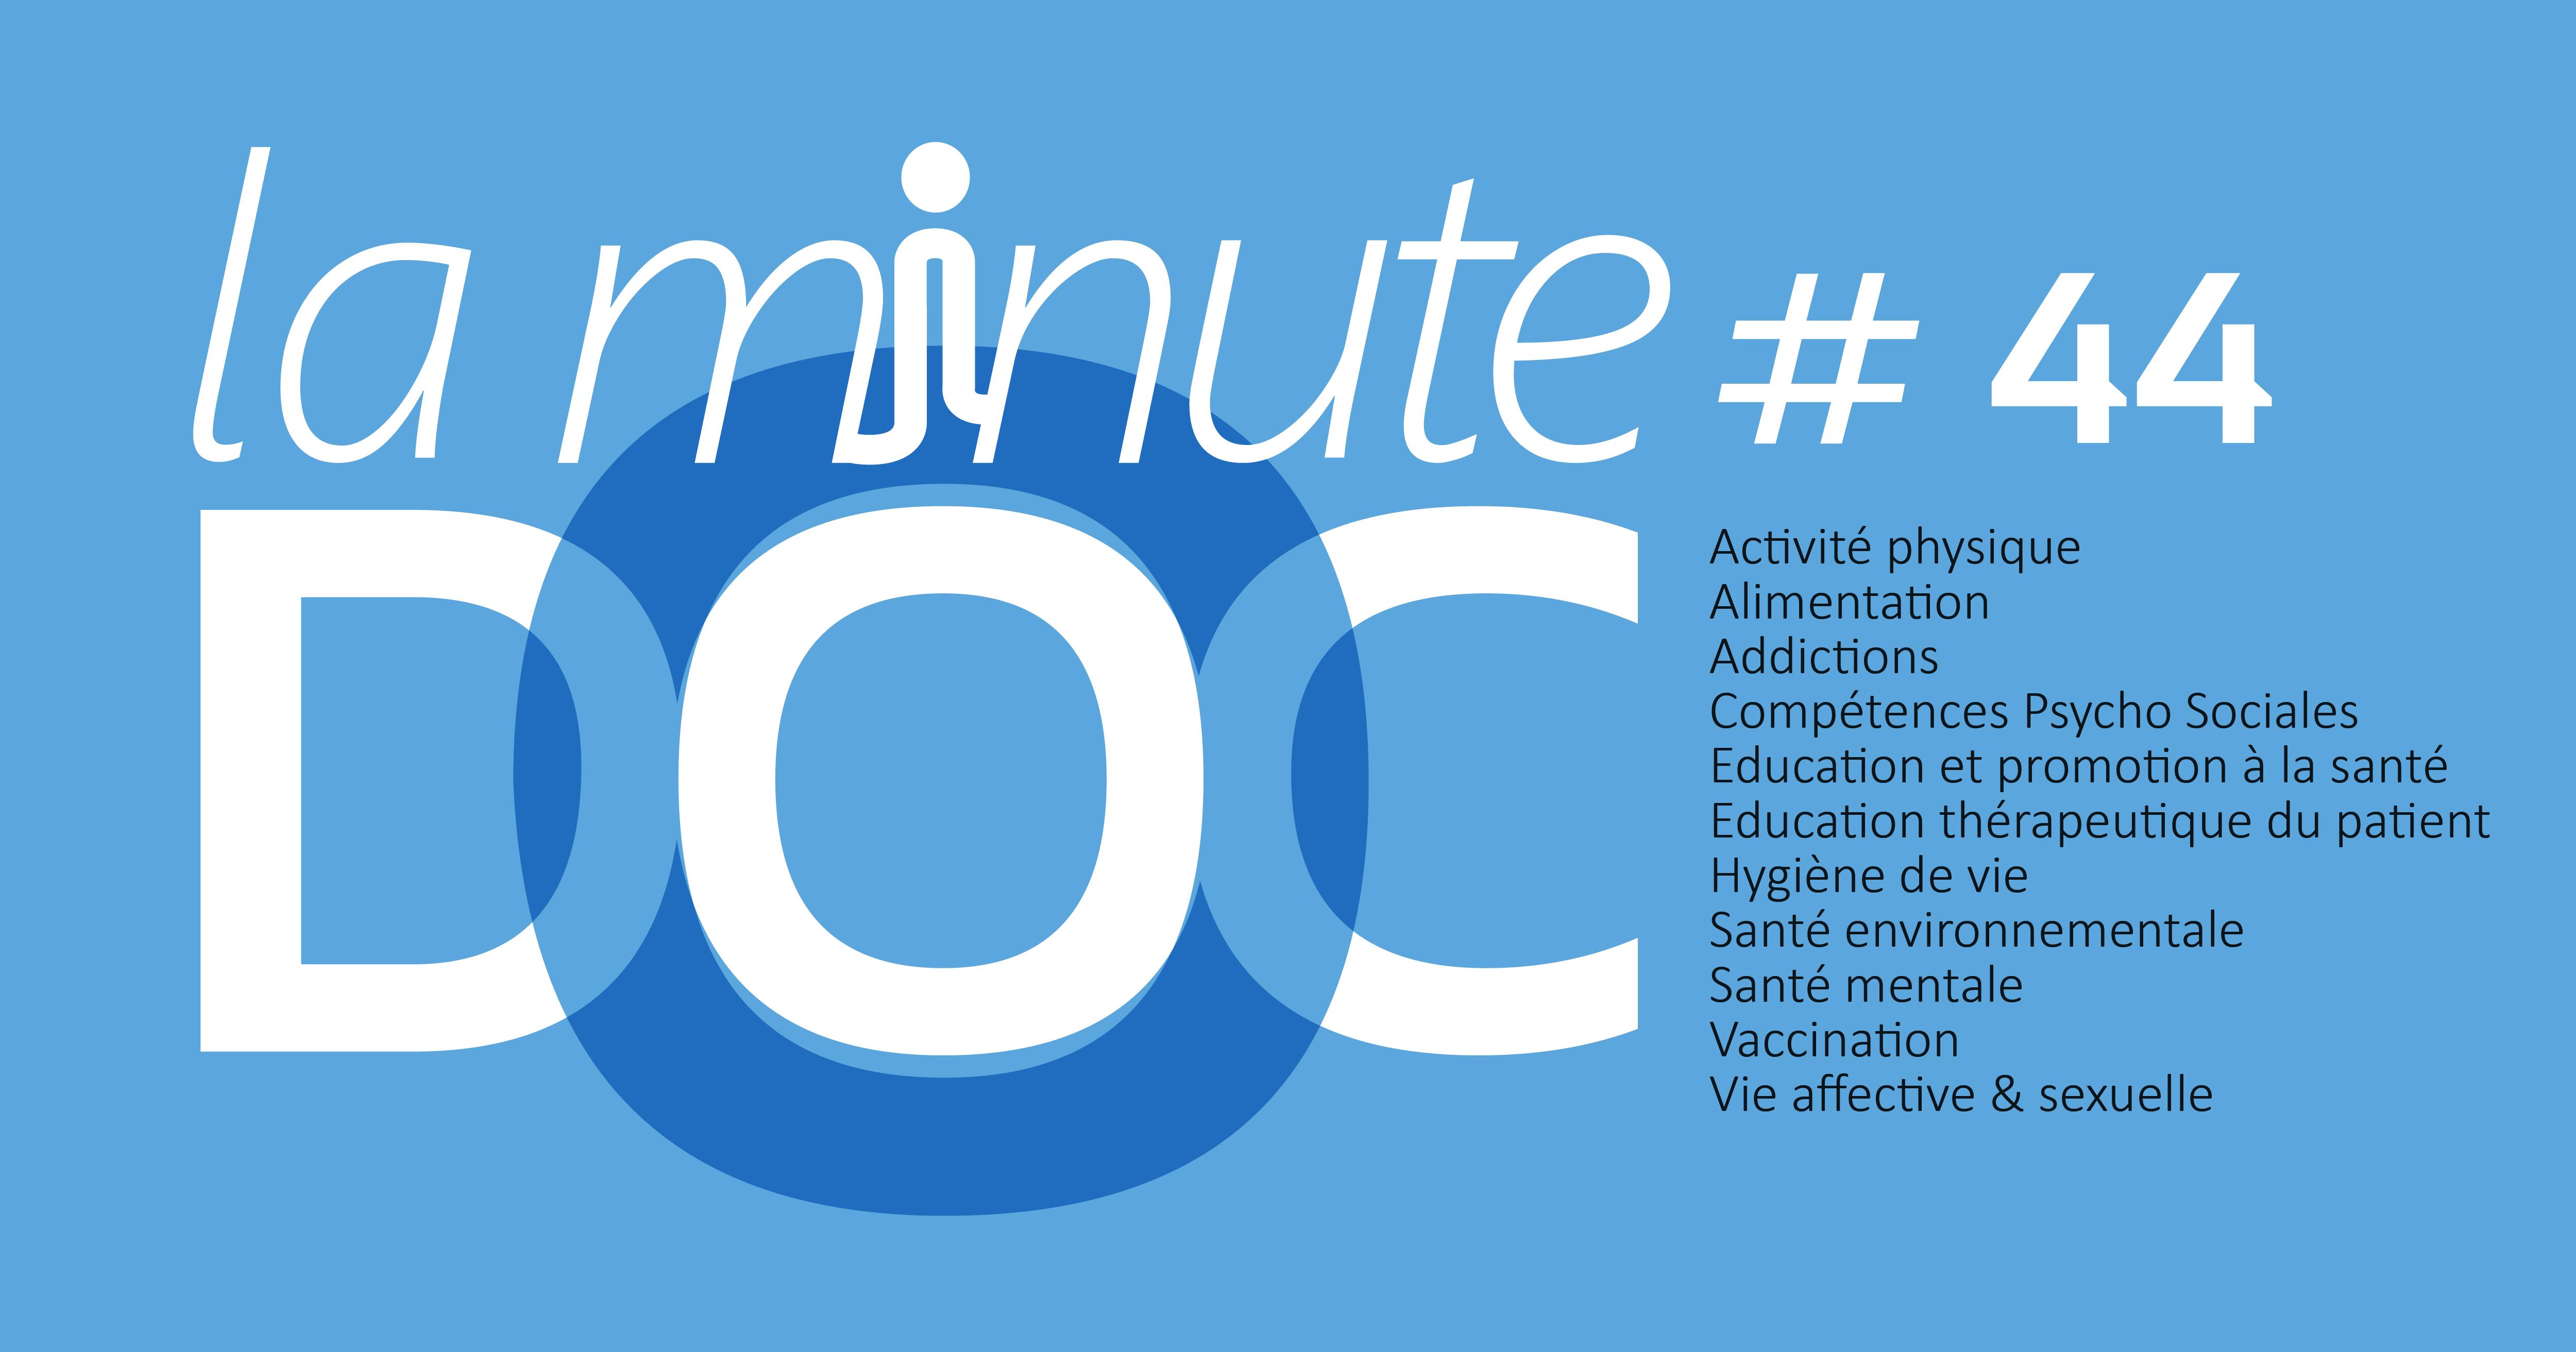 la minute doc #44